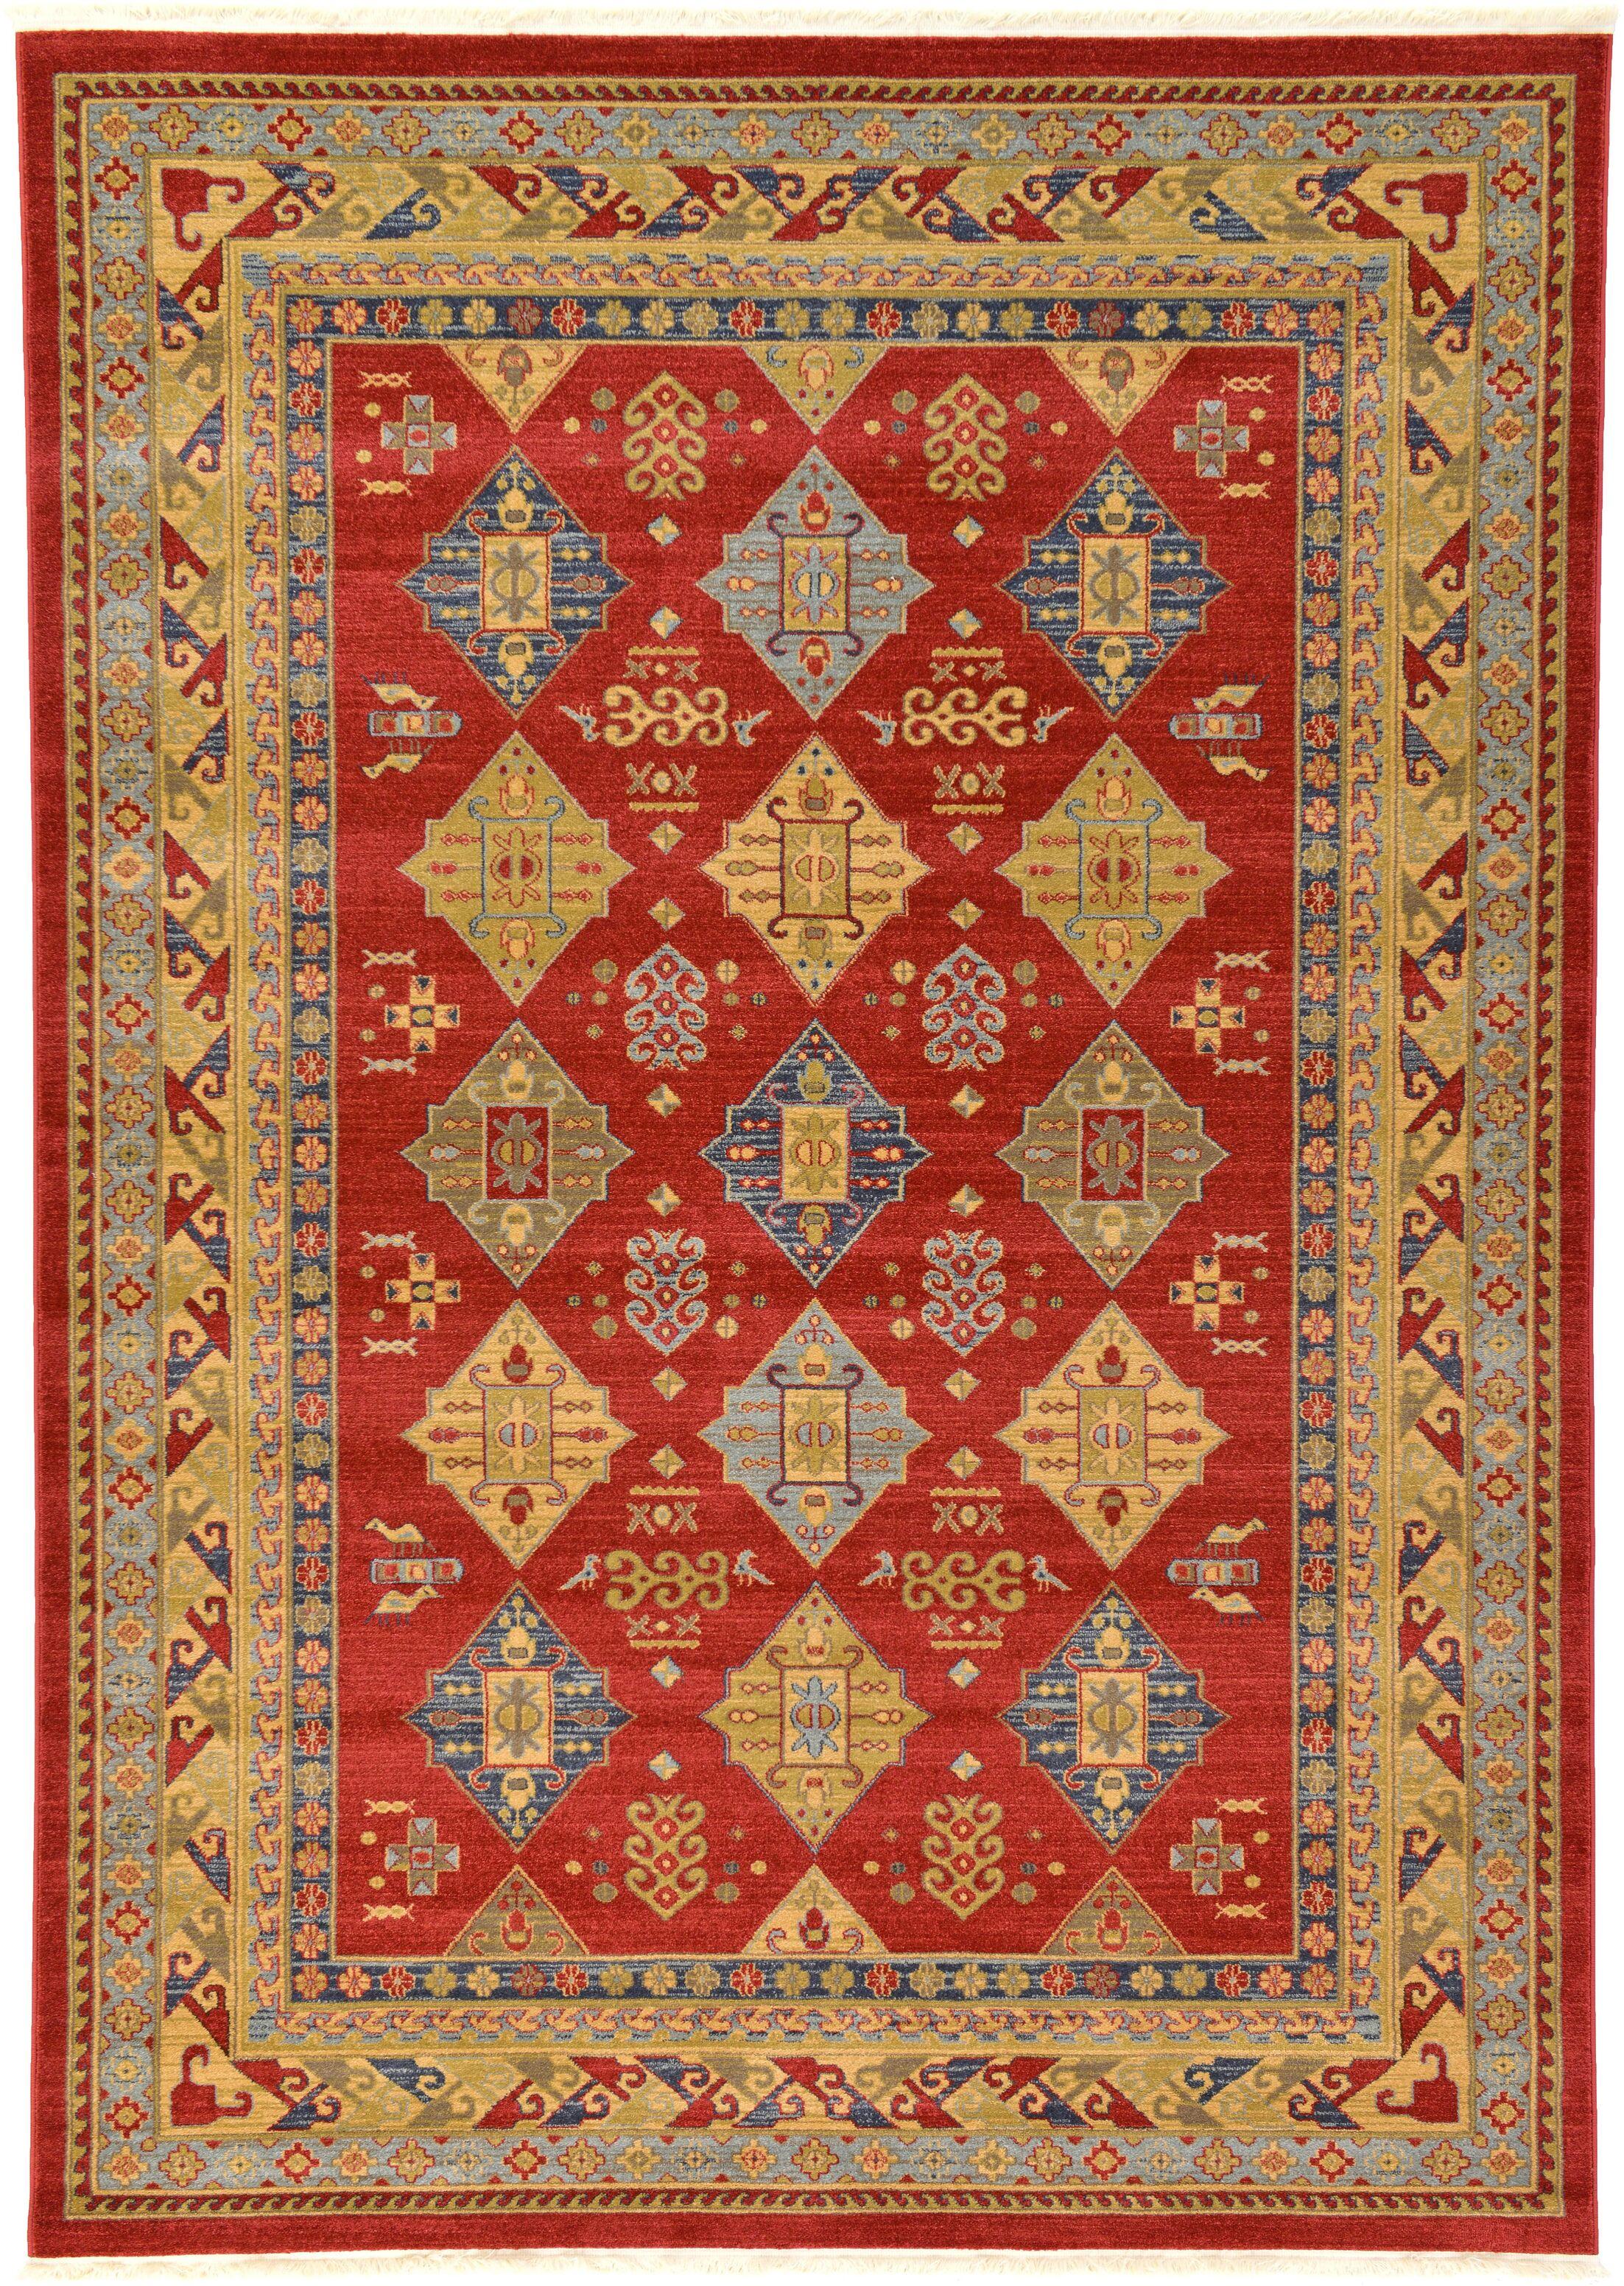 Jana Red Tibetan Area Rug Rug Size: Rectangle 7' x 10'